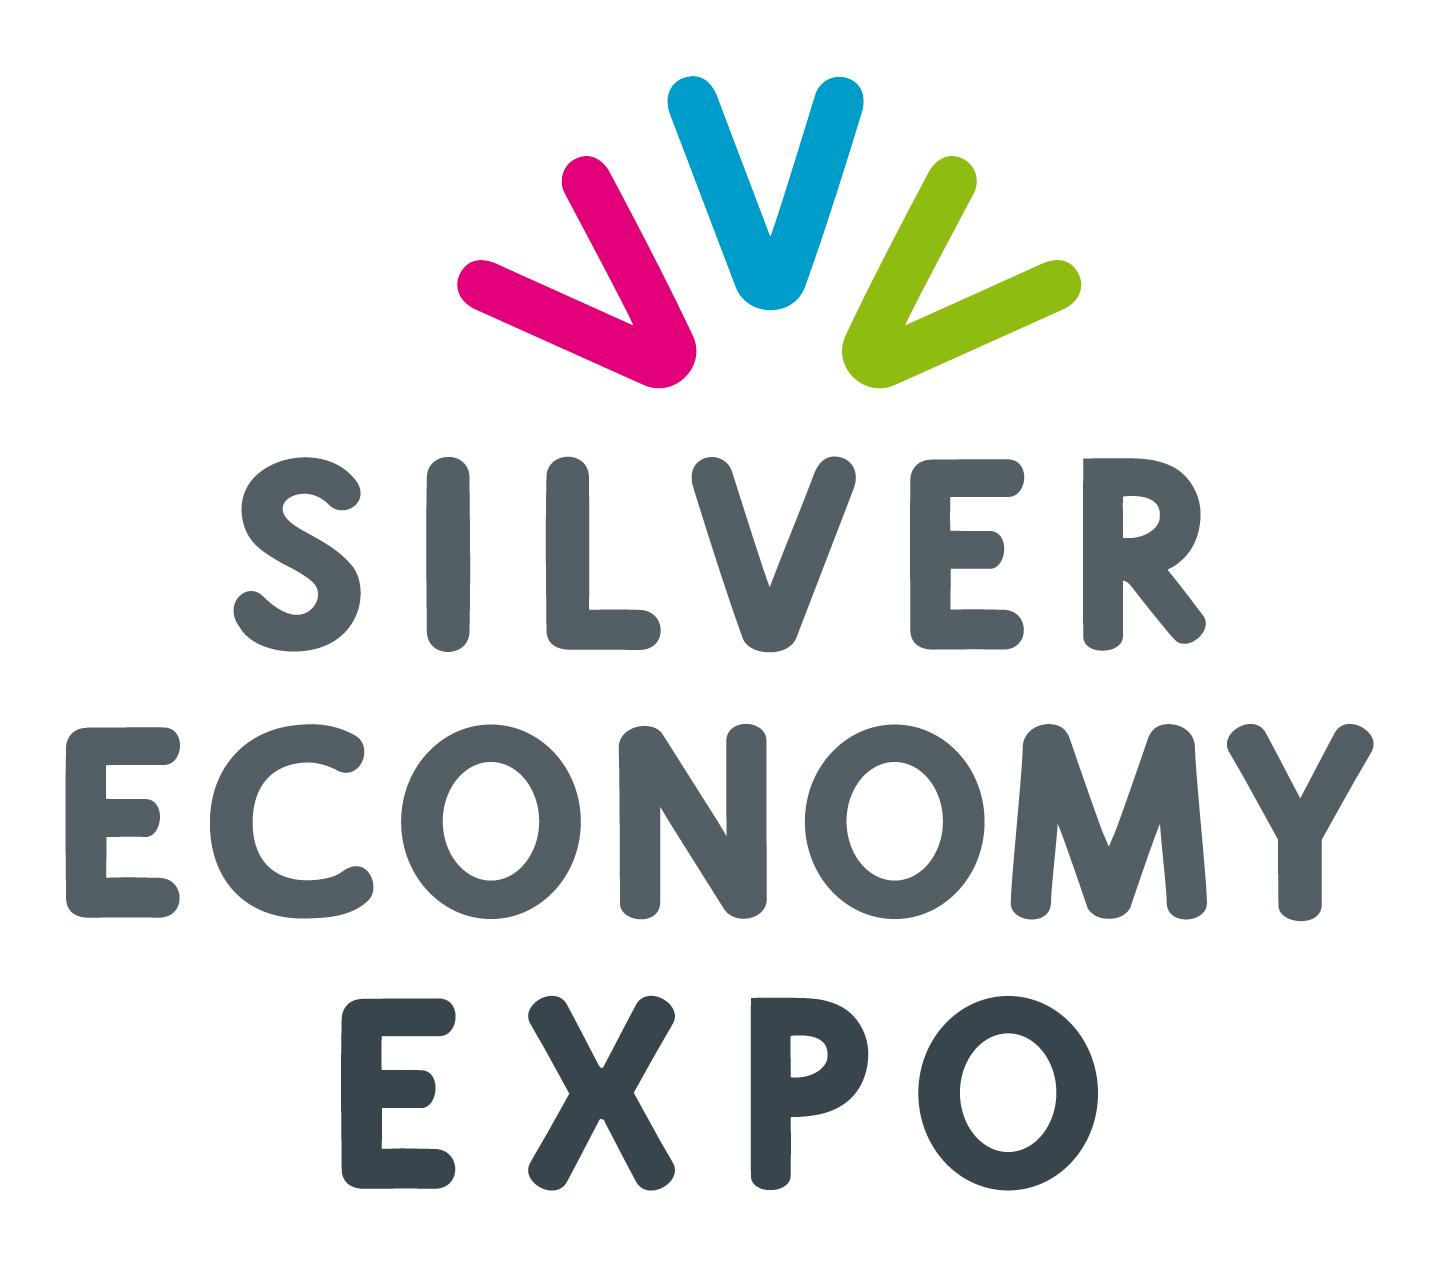 http://podcast.widoobiz.com.s3.amazonaws.com/wp-content/uploads/2014/11/Silver_Economy_Expo1.jpg